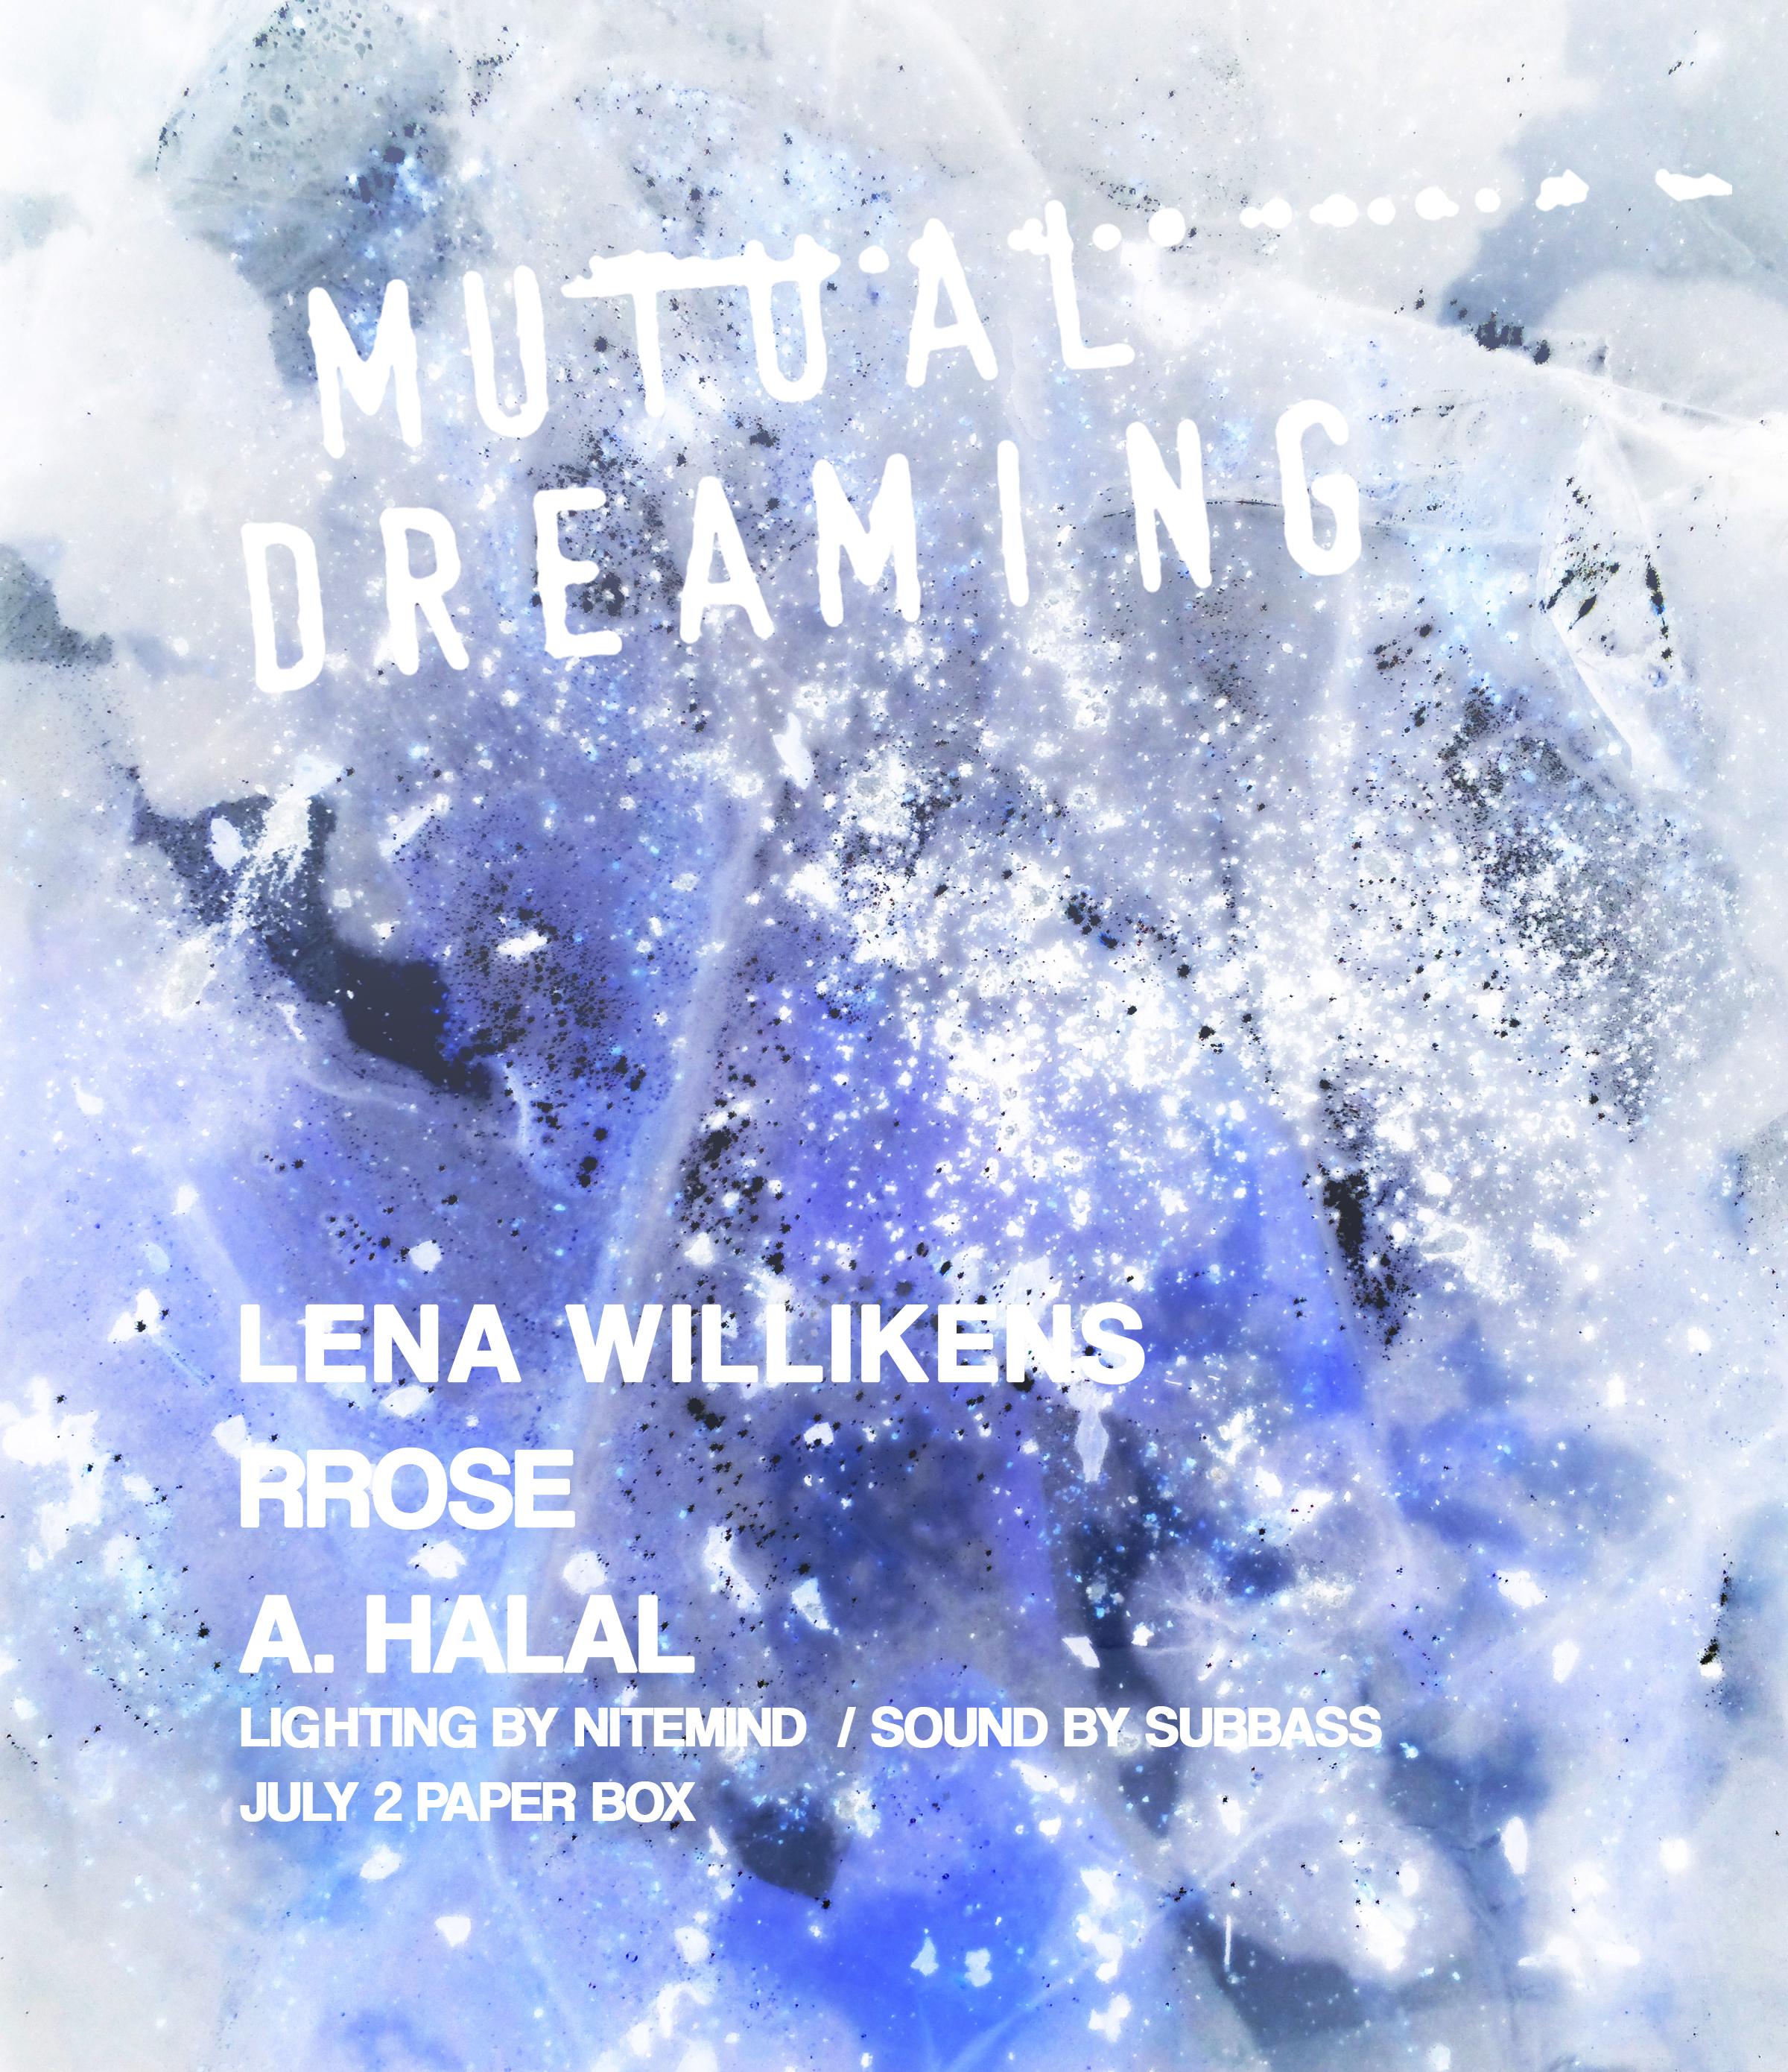 Mutual Dreaming: Rrose, Lena Willikens, A. Halal  July 2016